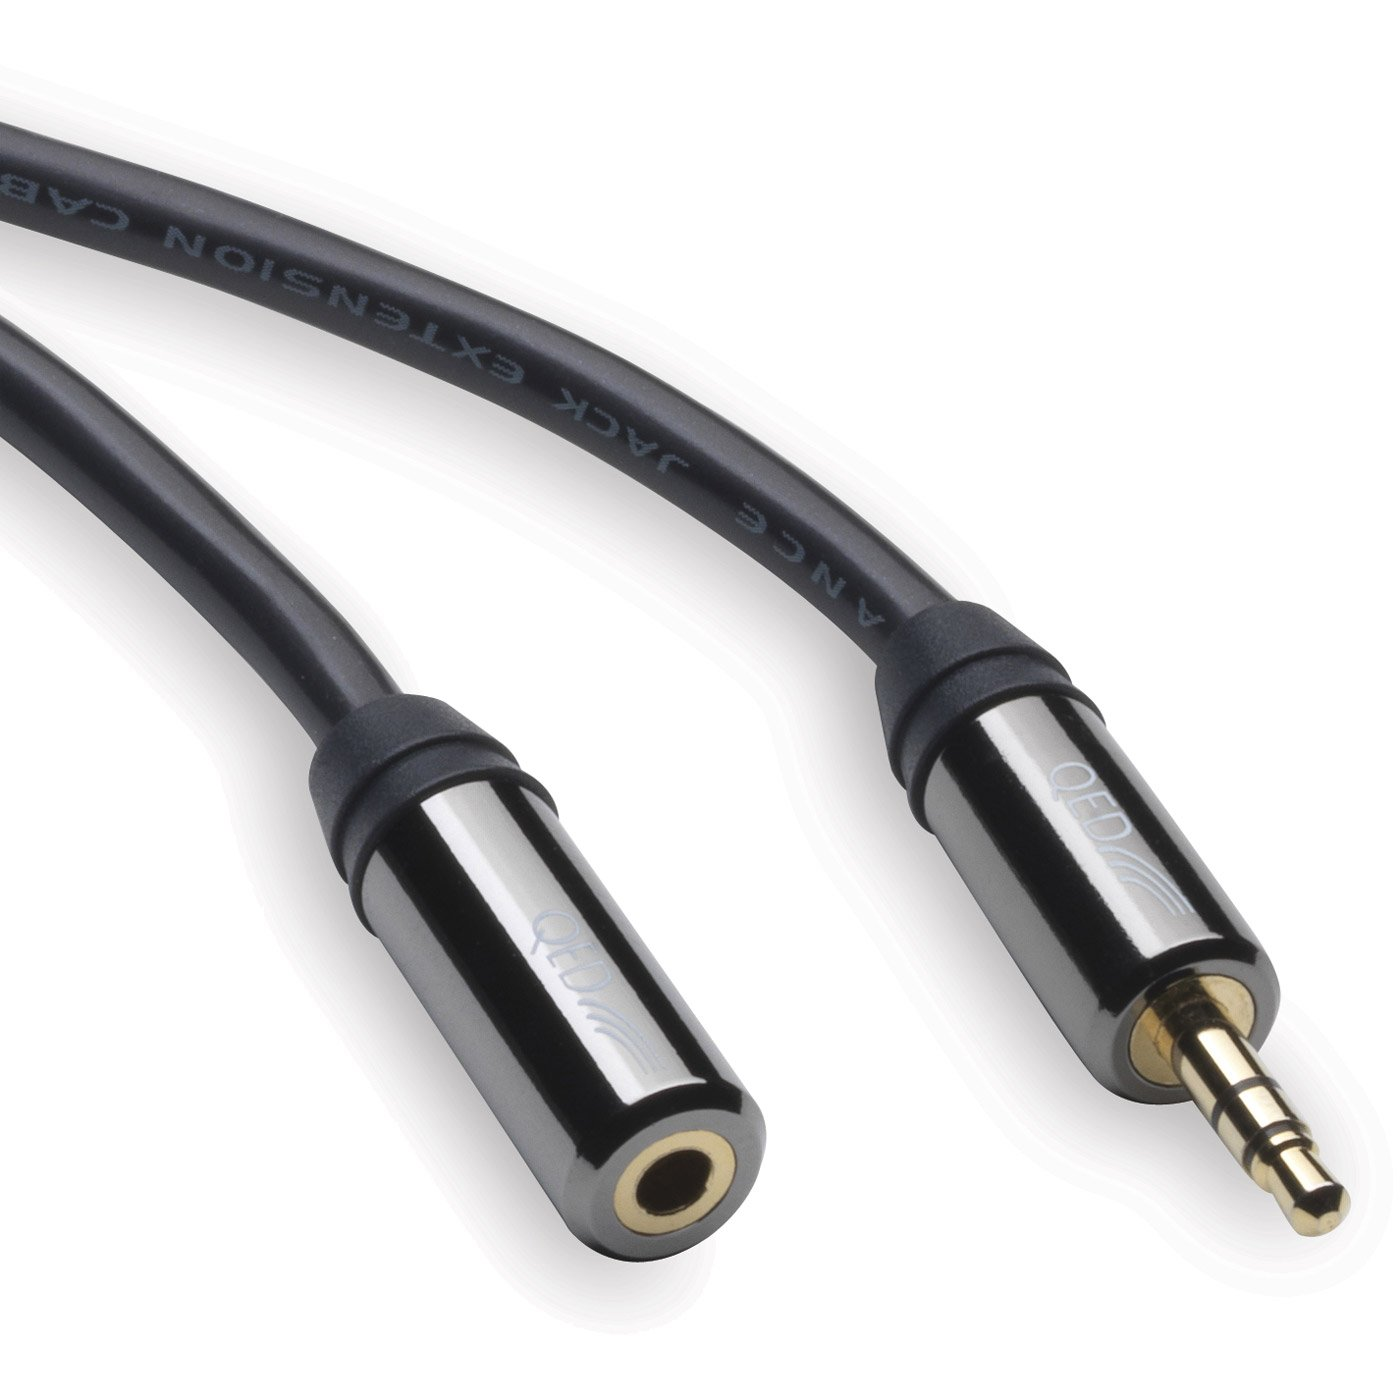 QED Performance 3.5mm Headphone Extension Lead: Amazon.co.uk ...